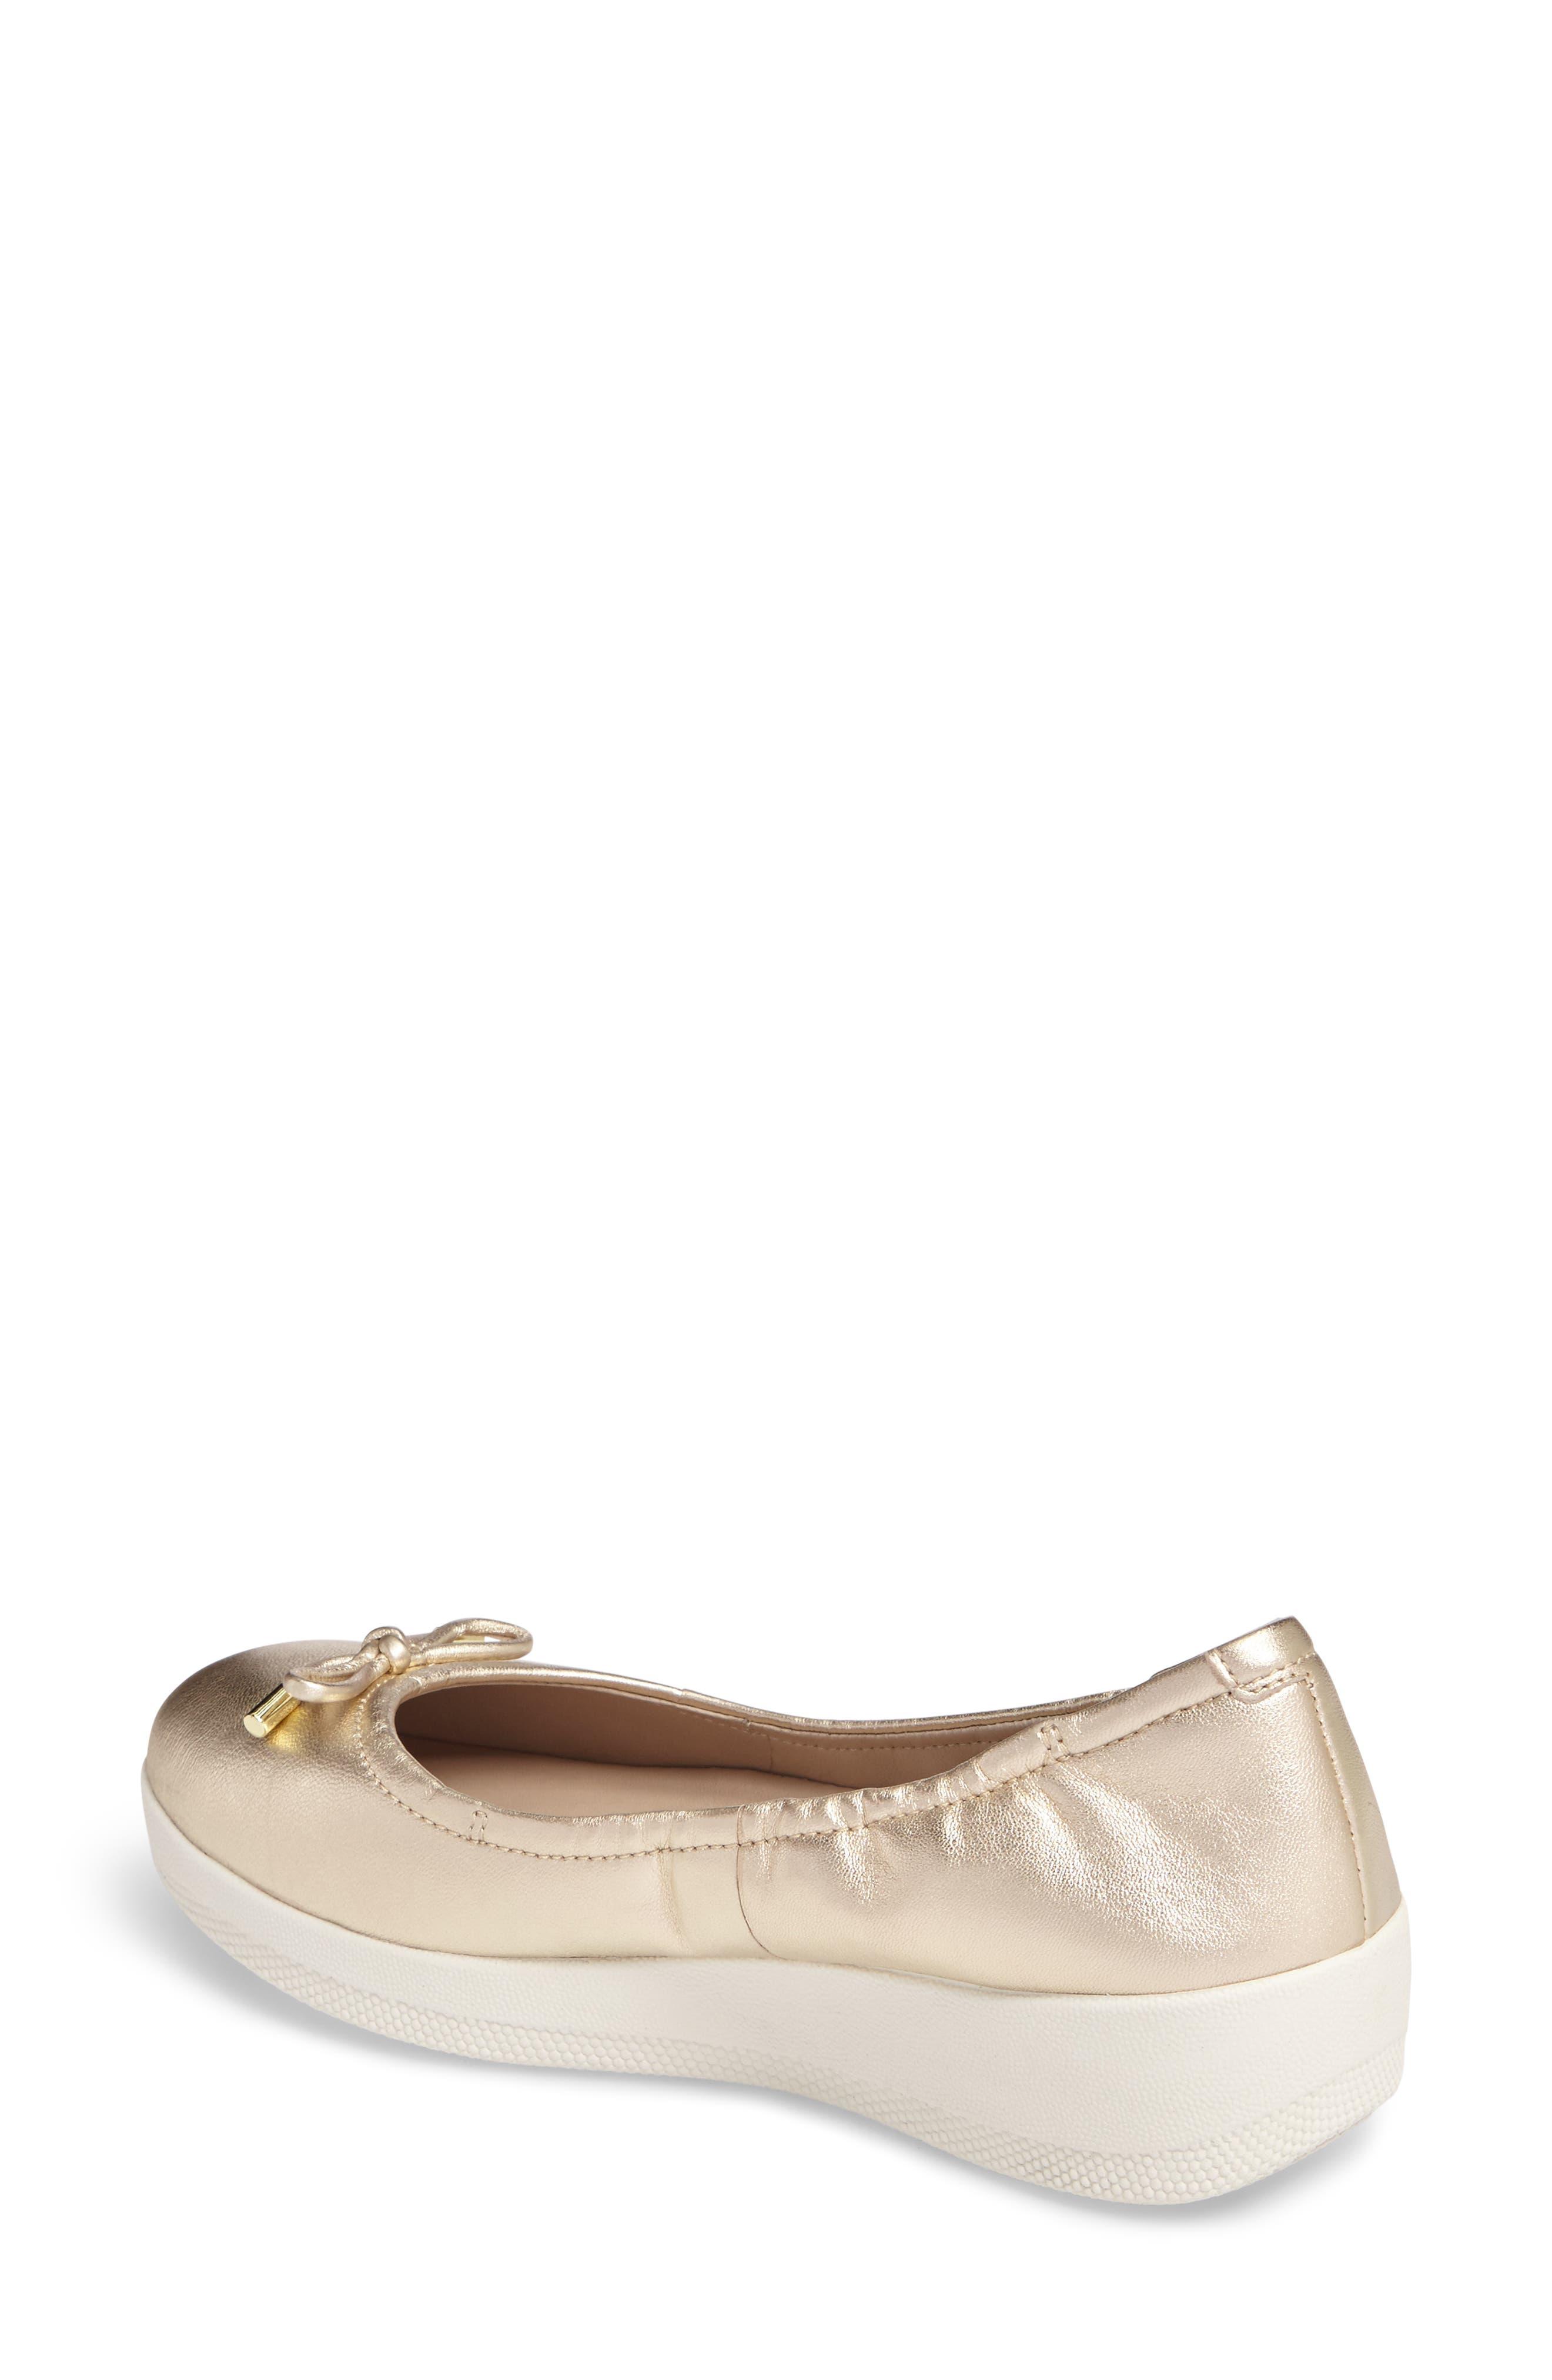 Alternate Image 2  - FitFlop Superbendy Ballerina Flat (Women)